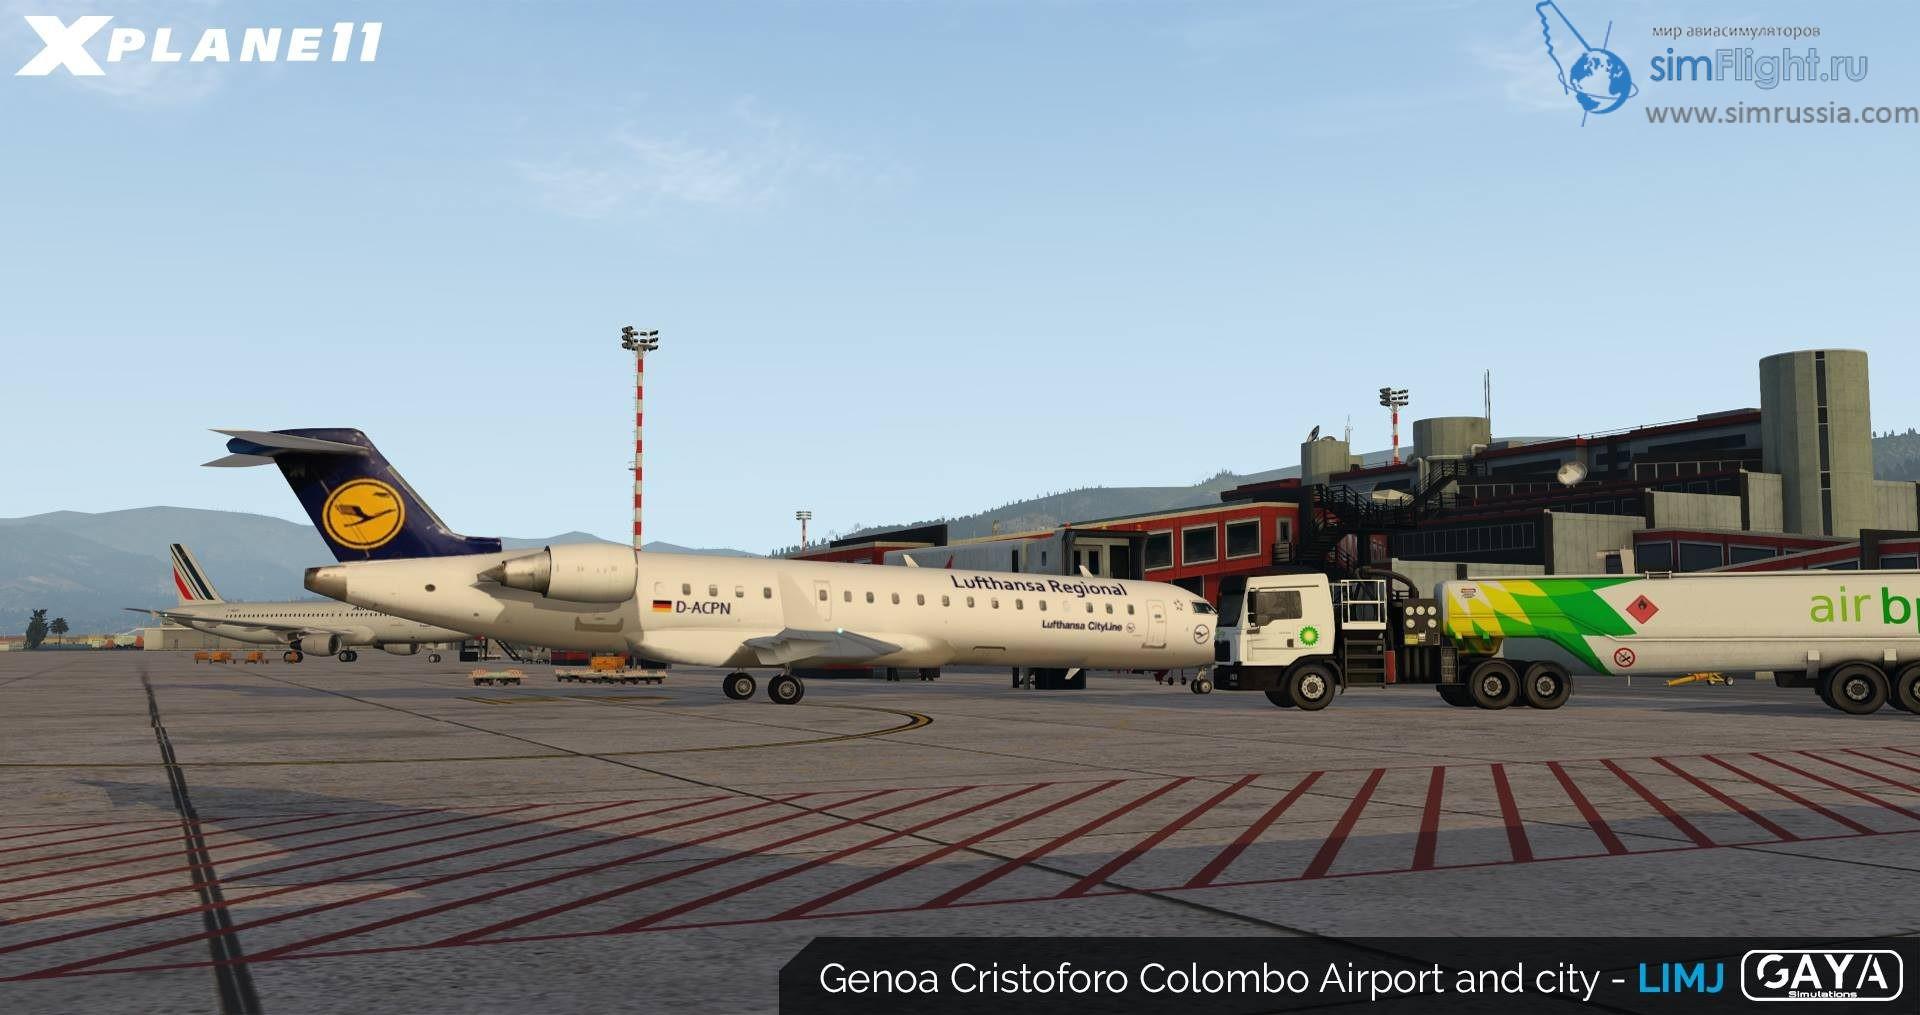 GayaSimulation - Genoa для X-Plane 11 анонс • simFlight Россия